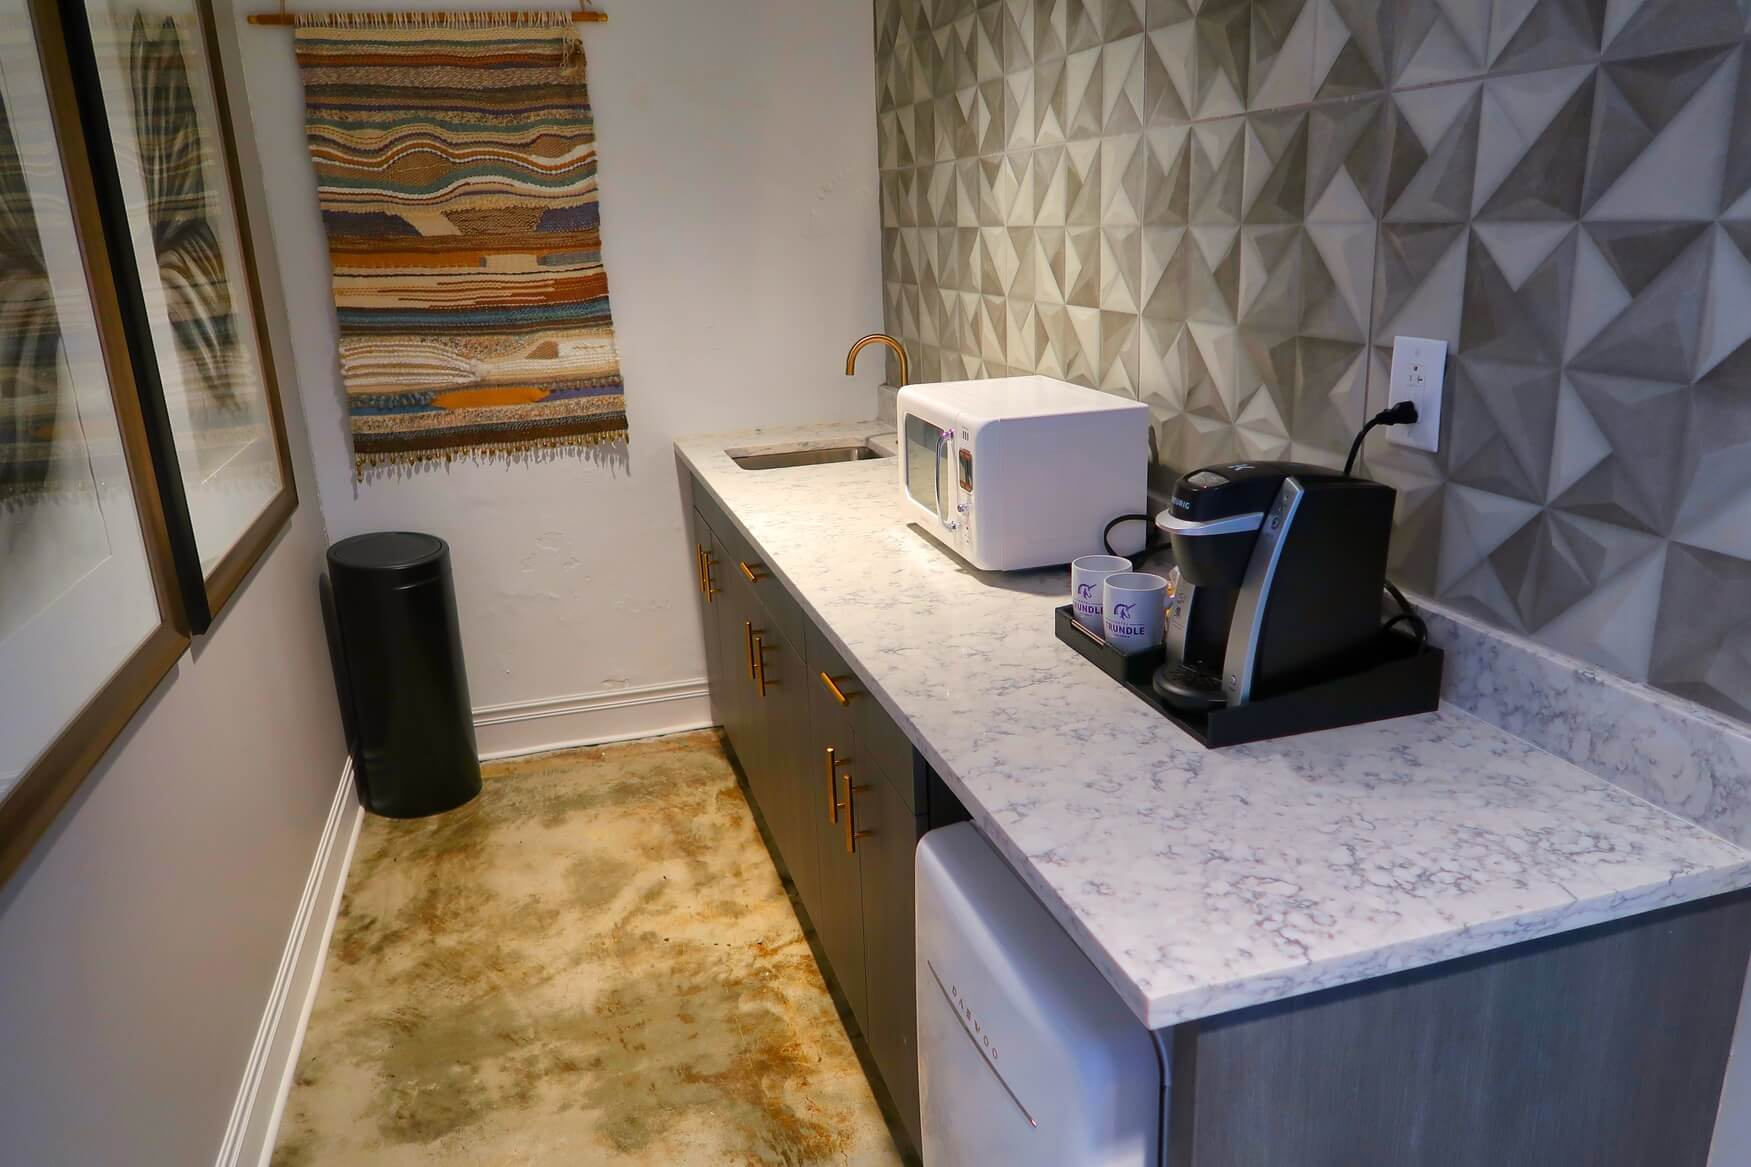 Hotel Trundle Kitchenette - Unicorn Suite